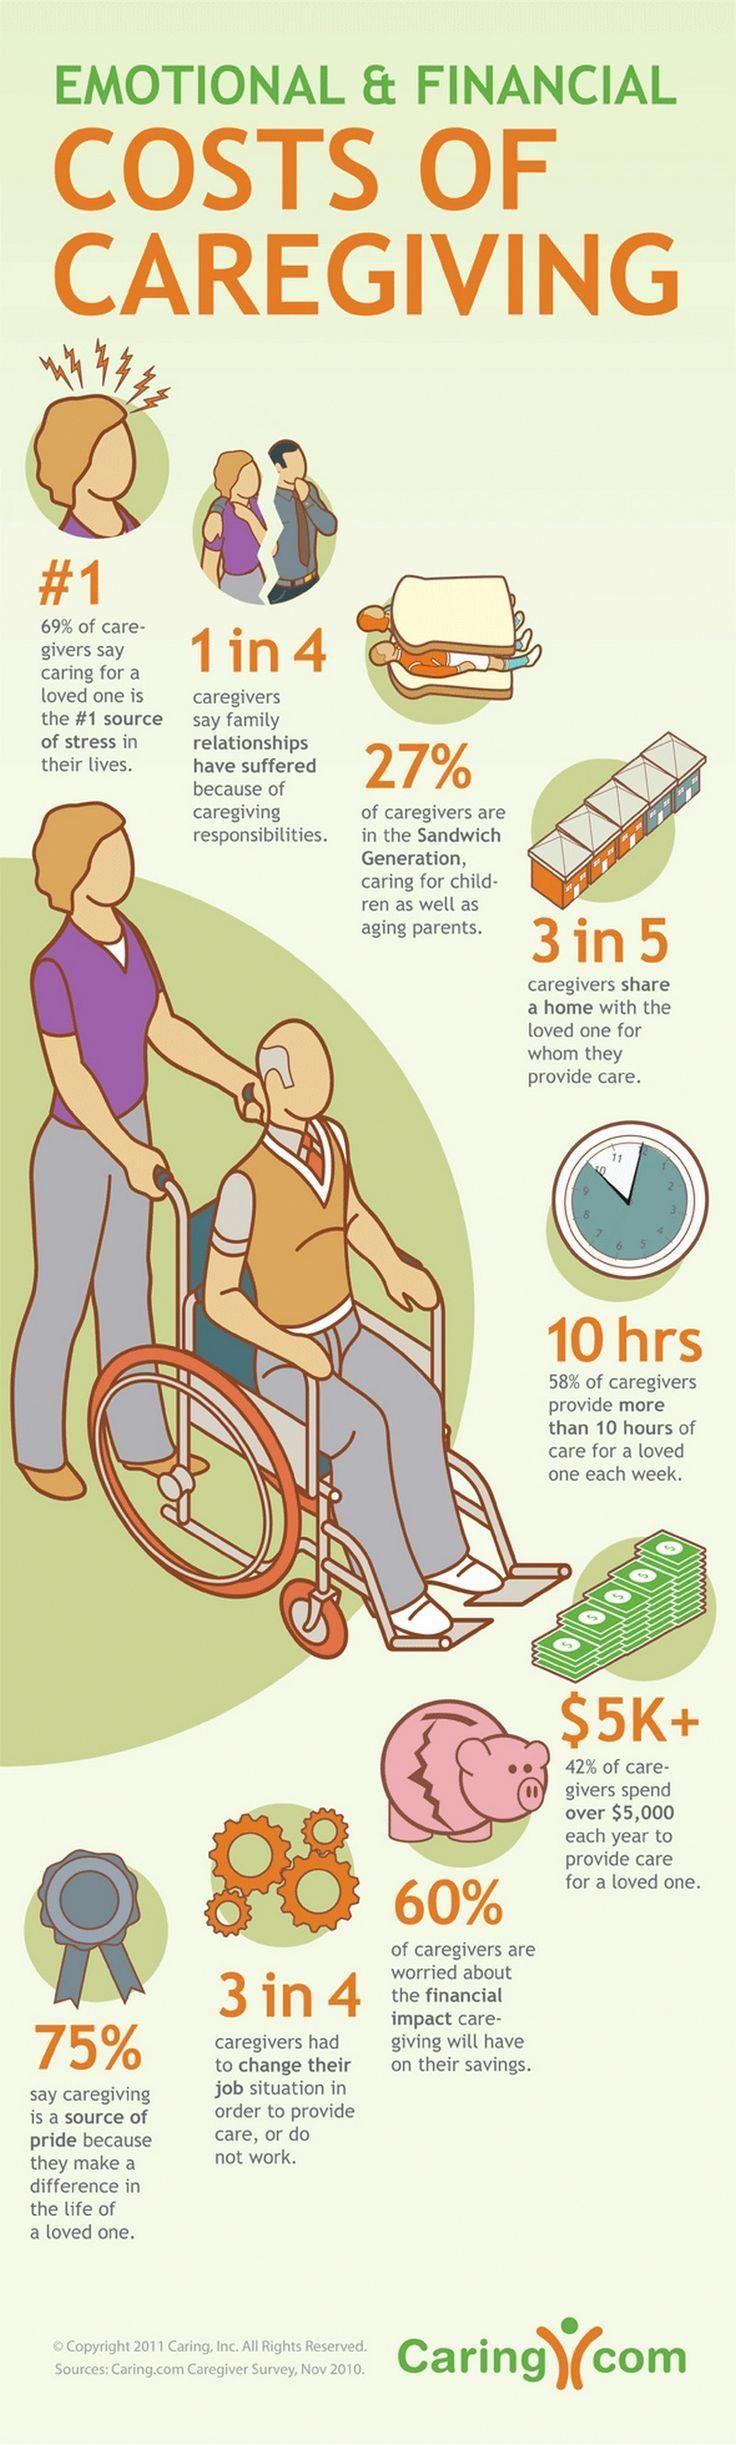 Alzheimer's Disease by the Numbers #elderlycarehacks